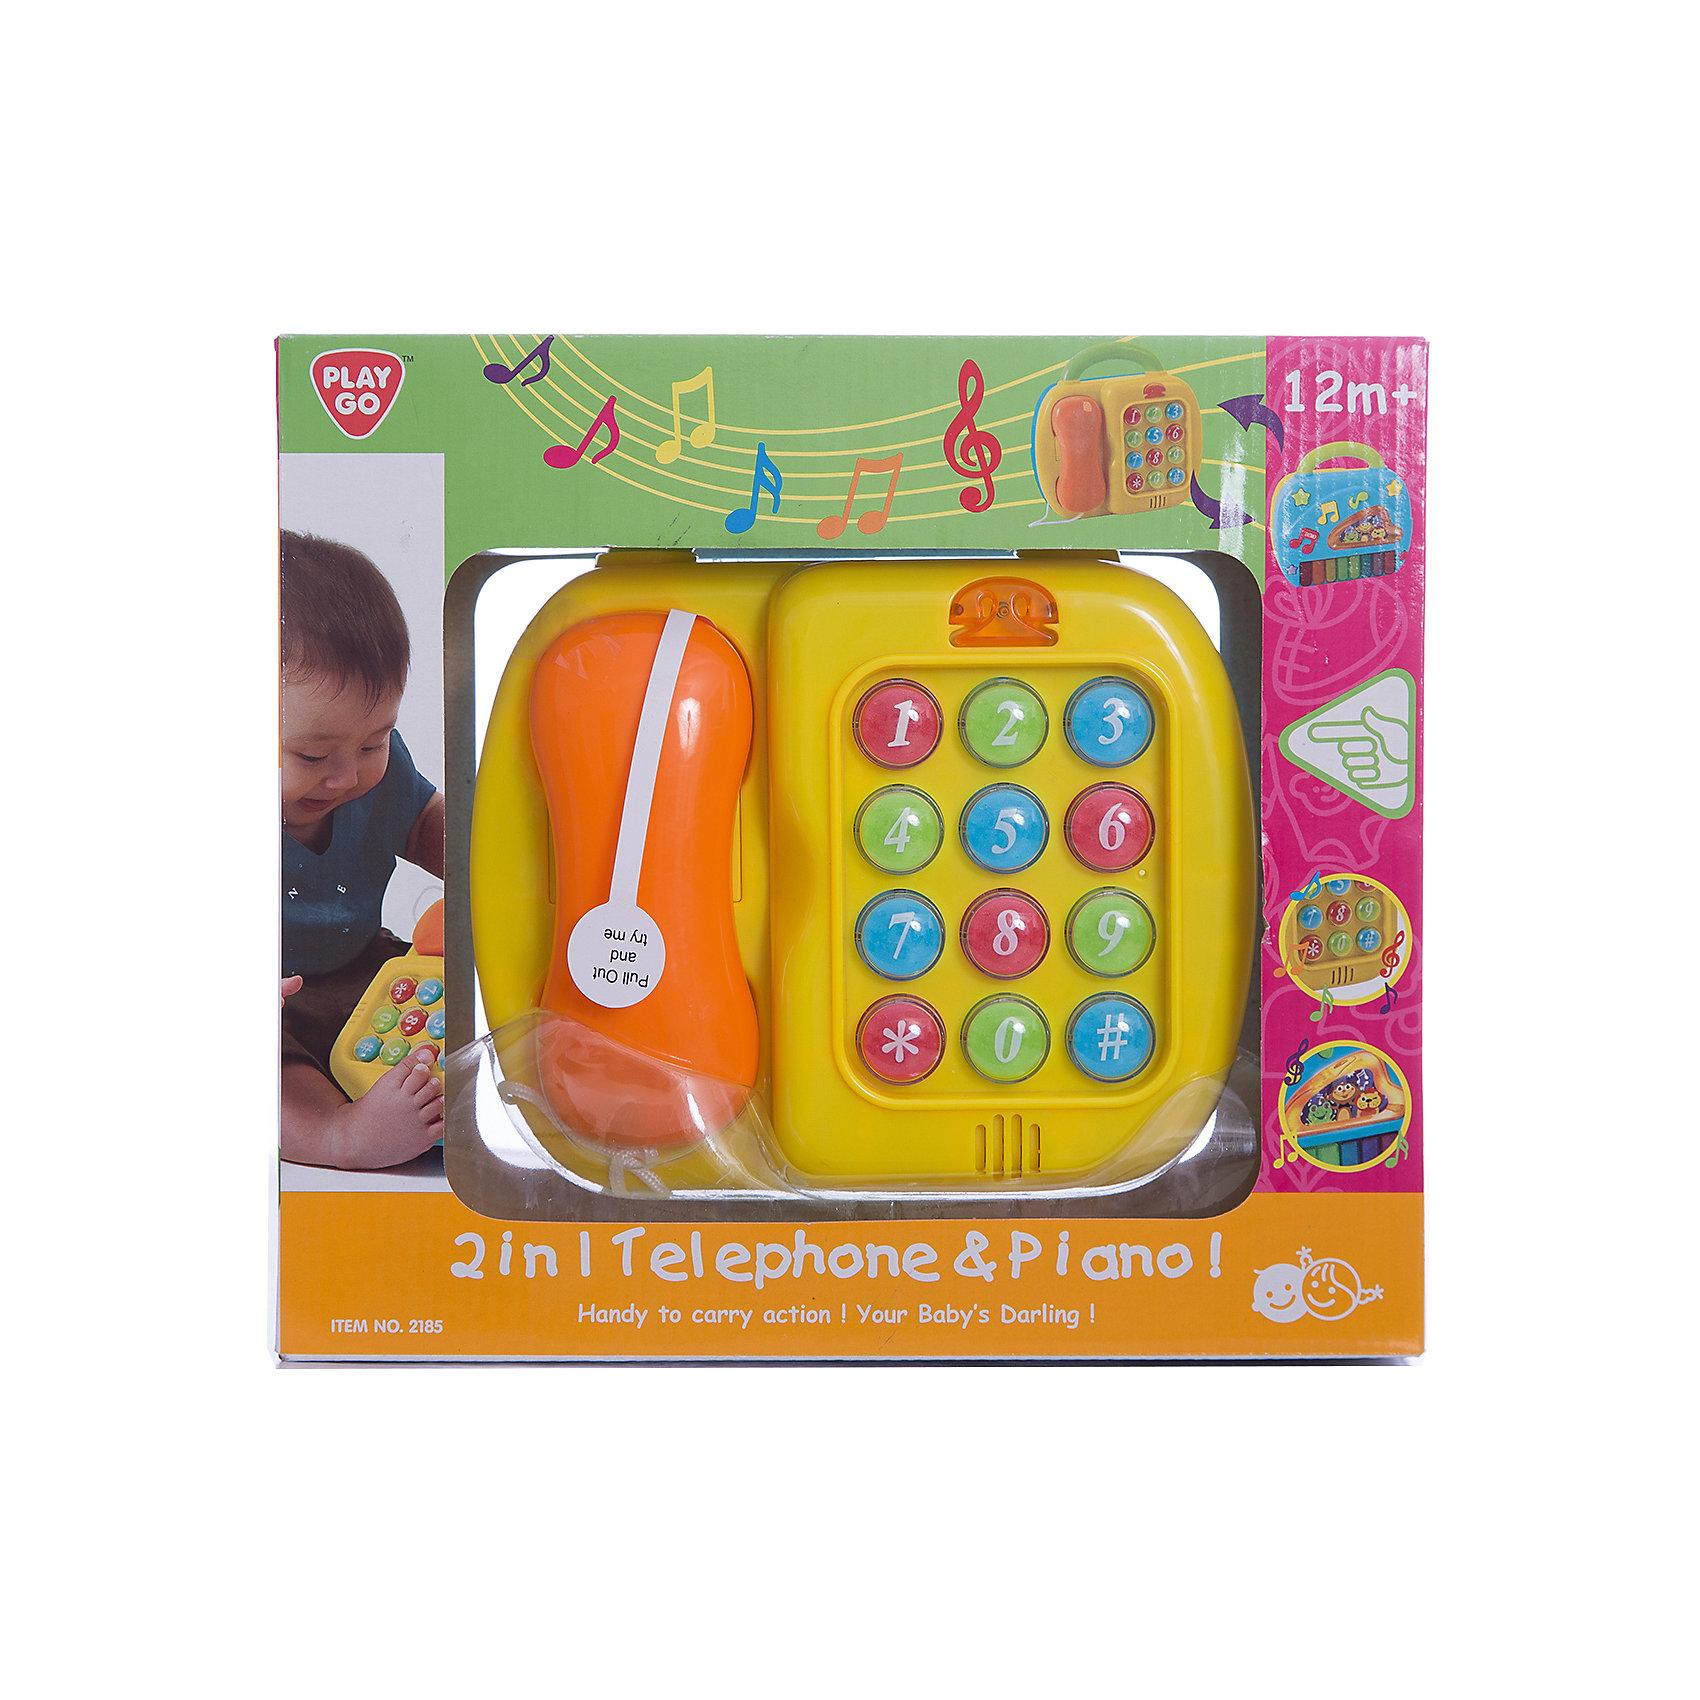 - Развивающий центр Телефон и пианино, Playgo игрушка s s toys bambini 2 в 1 развивающий телефон и пианино сс76752